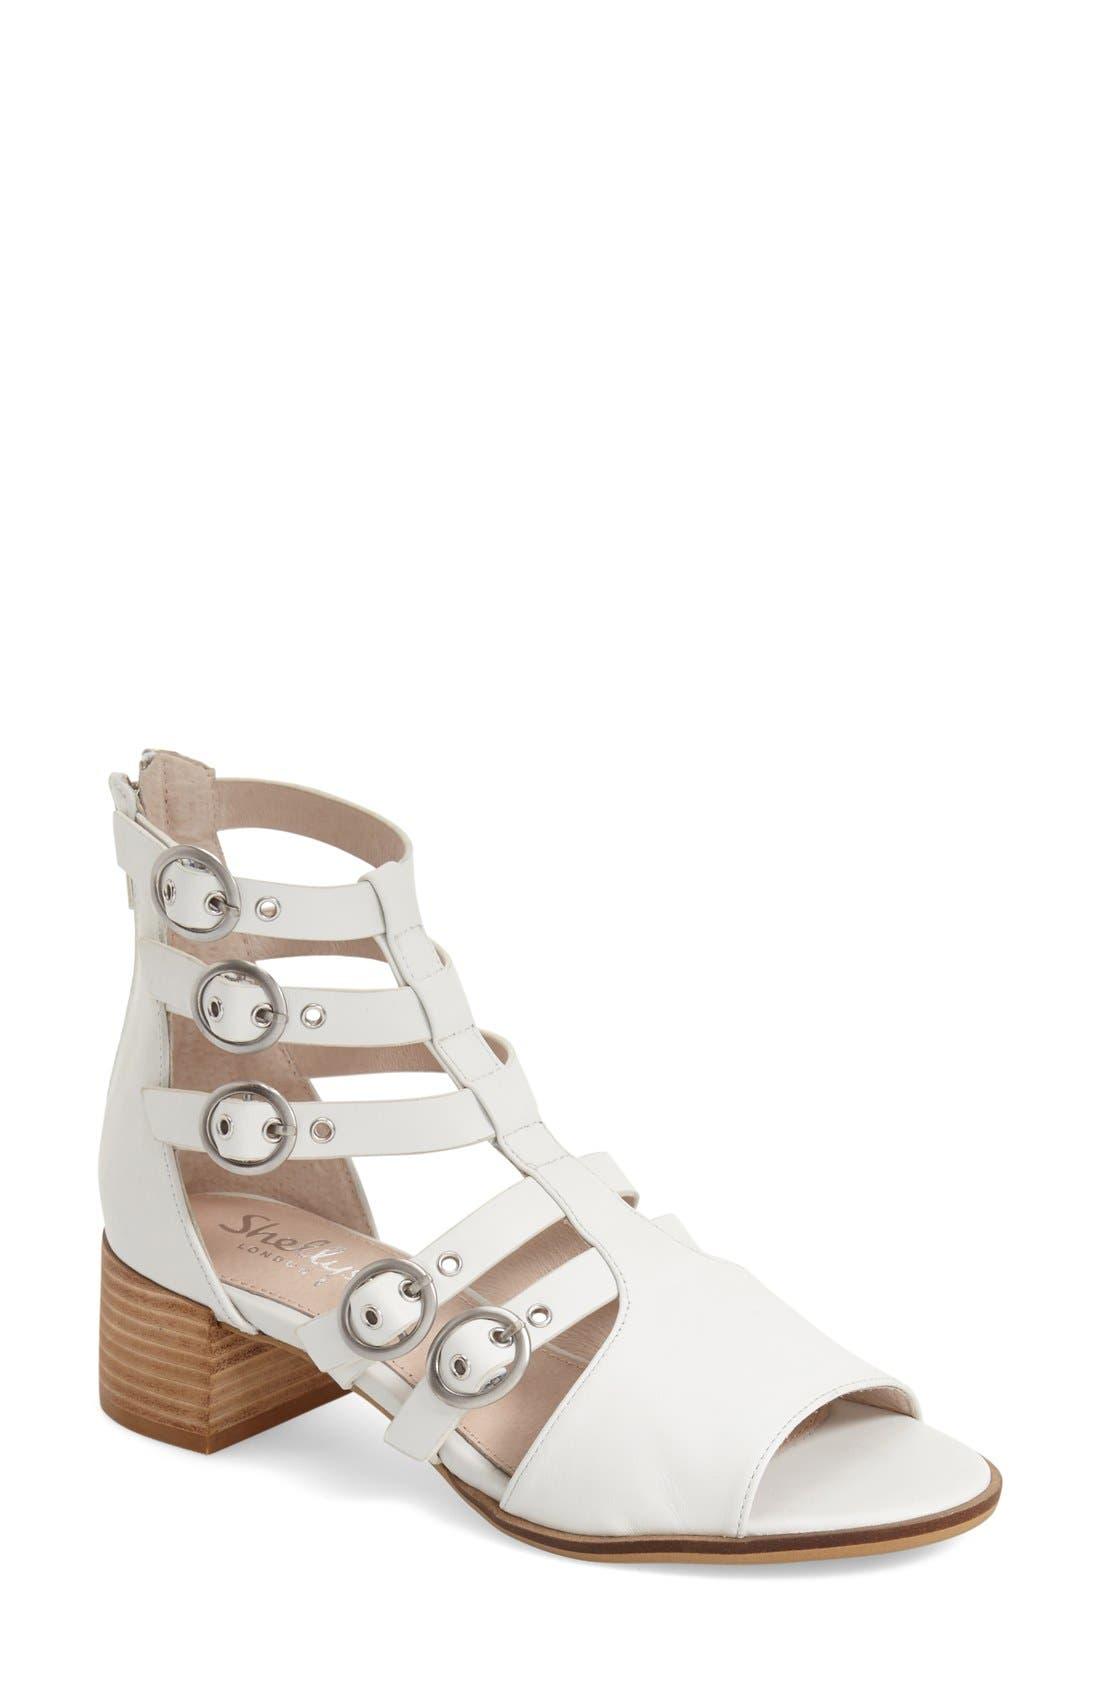 Main Image - Shellys London 'Bea' Buckle Sandal (Women)